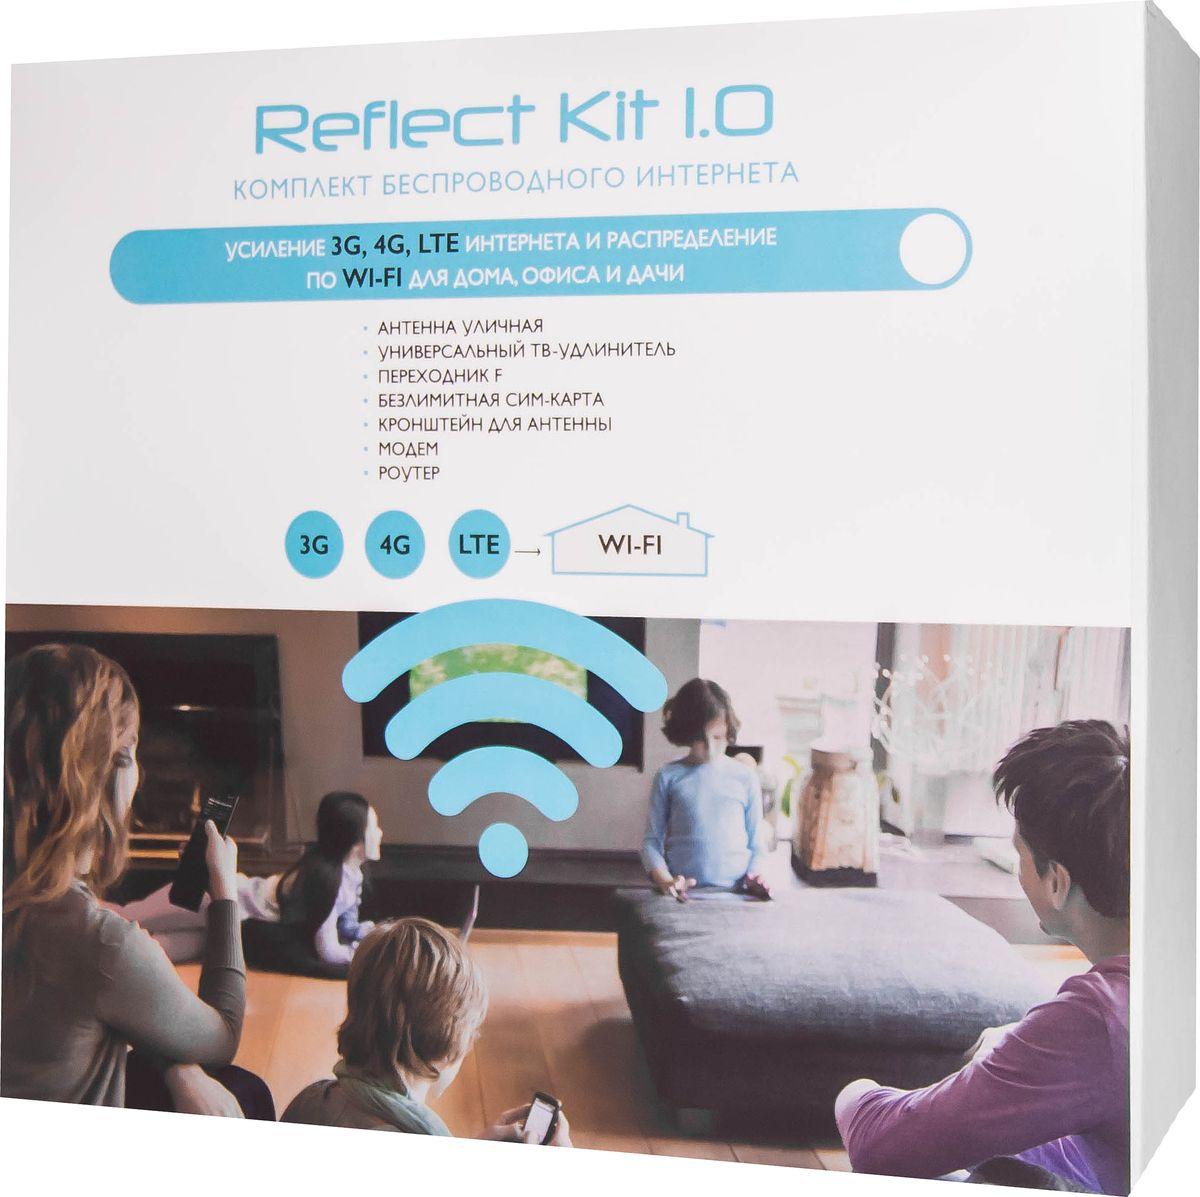 Reflect KIT 1.0, White комплект беспроводного интернета 3G/4G/LTE